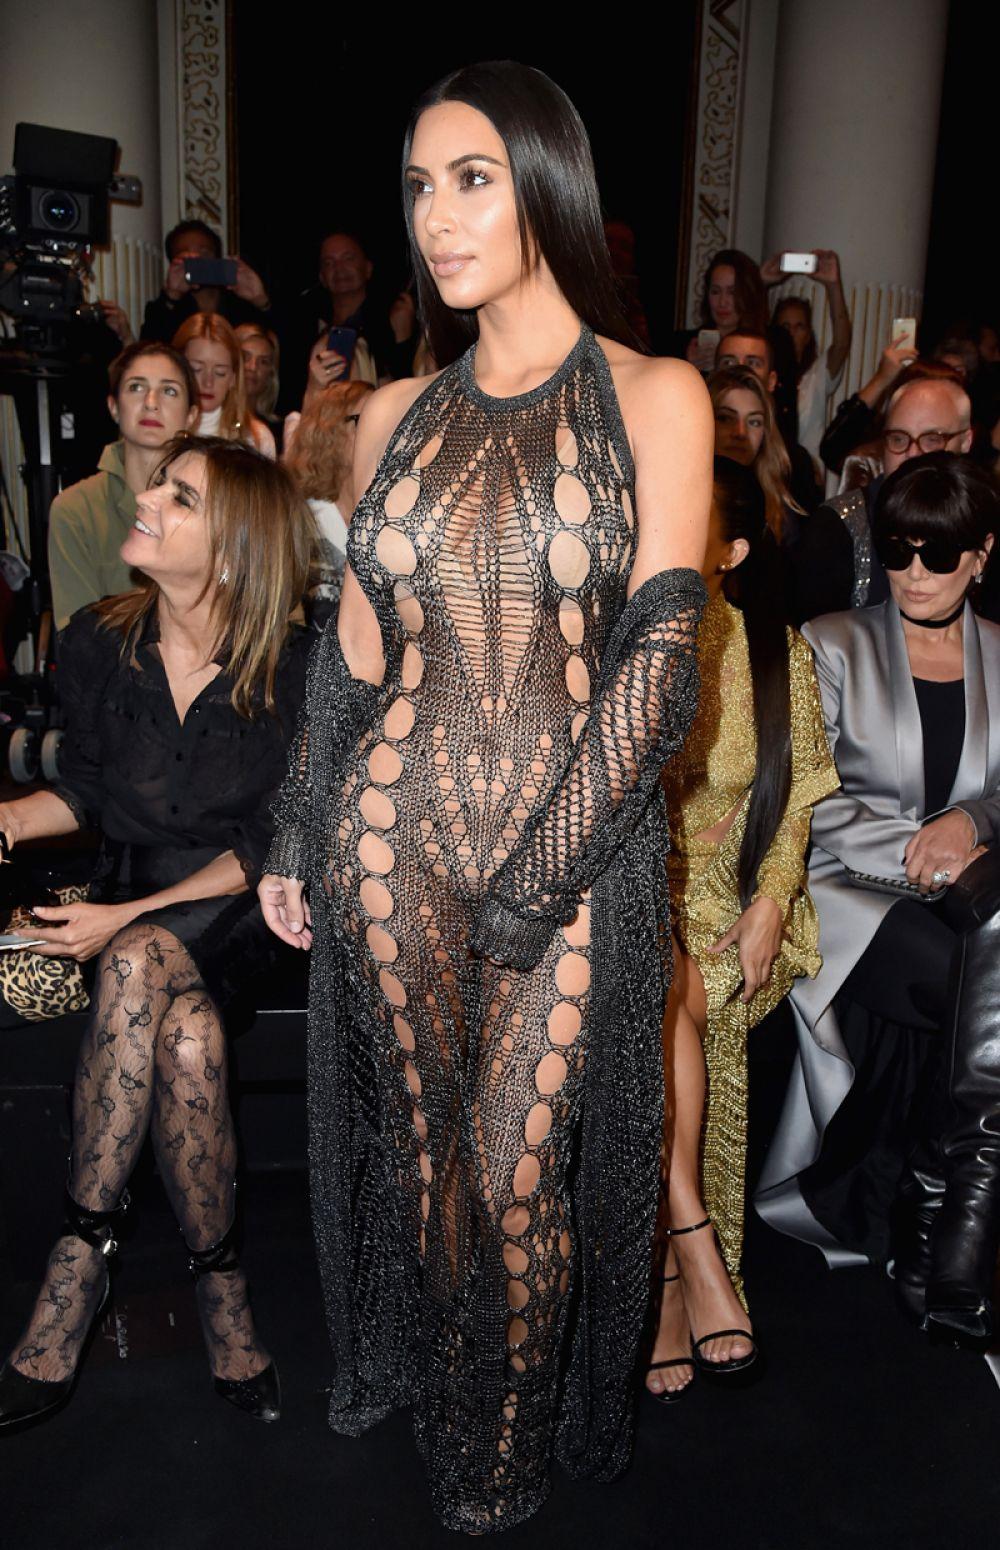 Kim And Kourtney Kardashian At Balmain Fashion Show At Paris Fashion Week 09 29 2016 Hawtcelebs